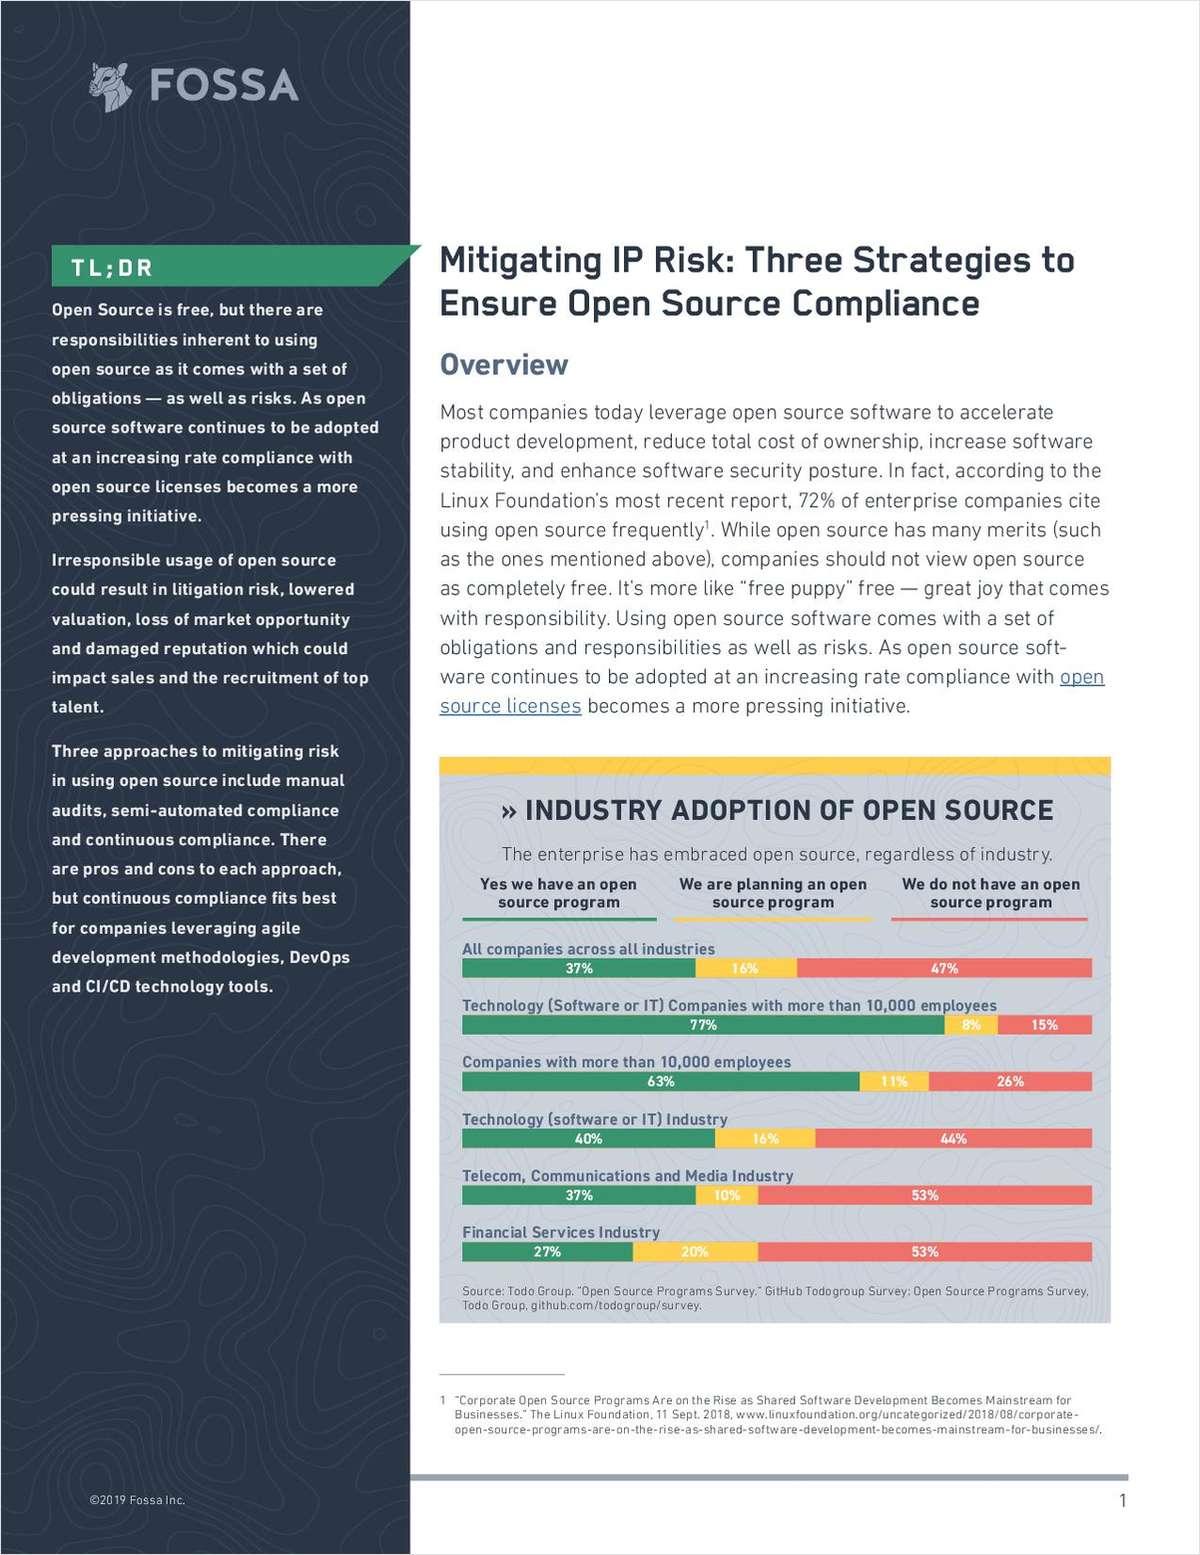 Mitigating IP Risk in Open Source